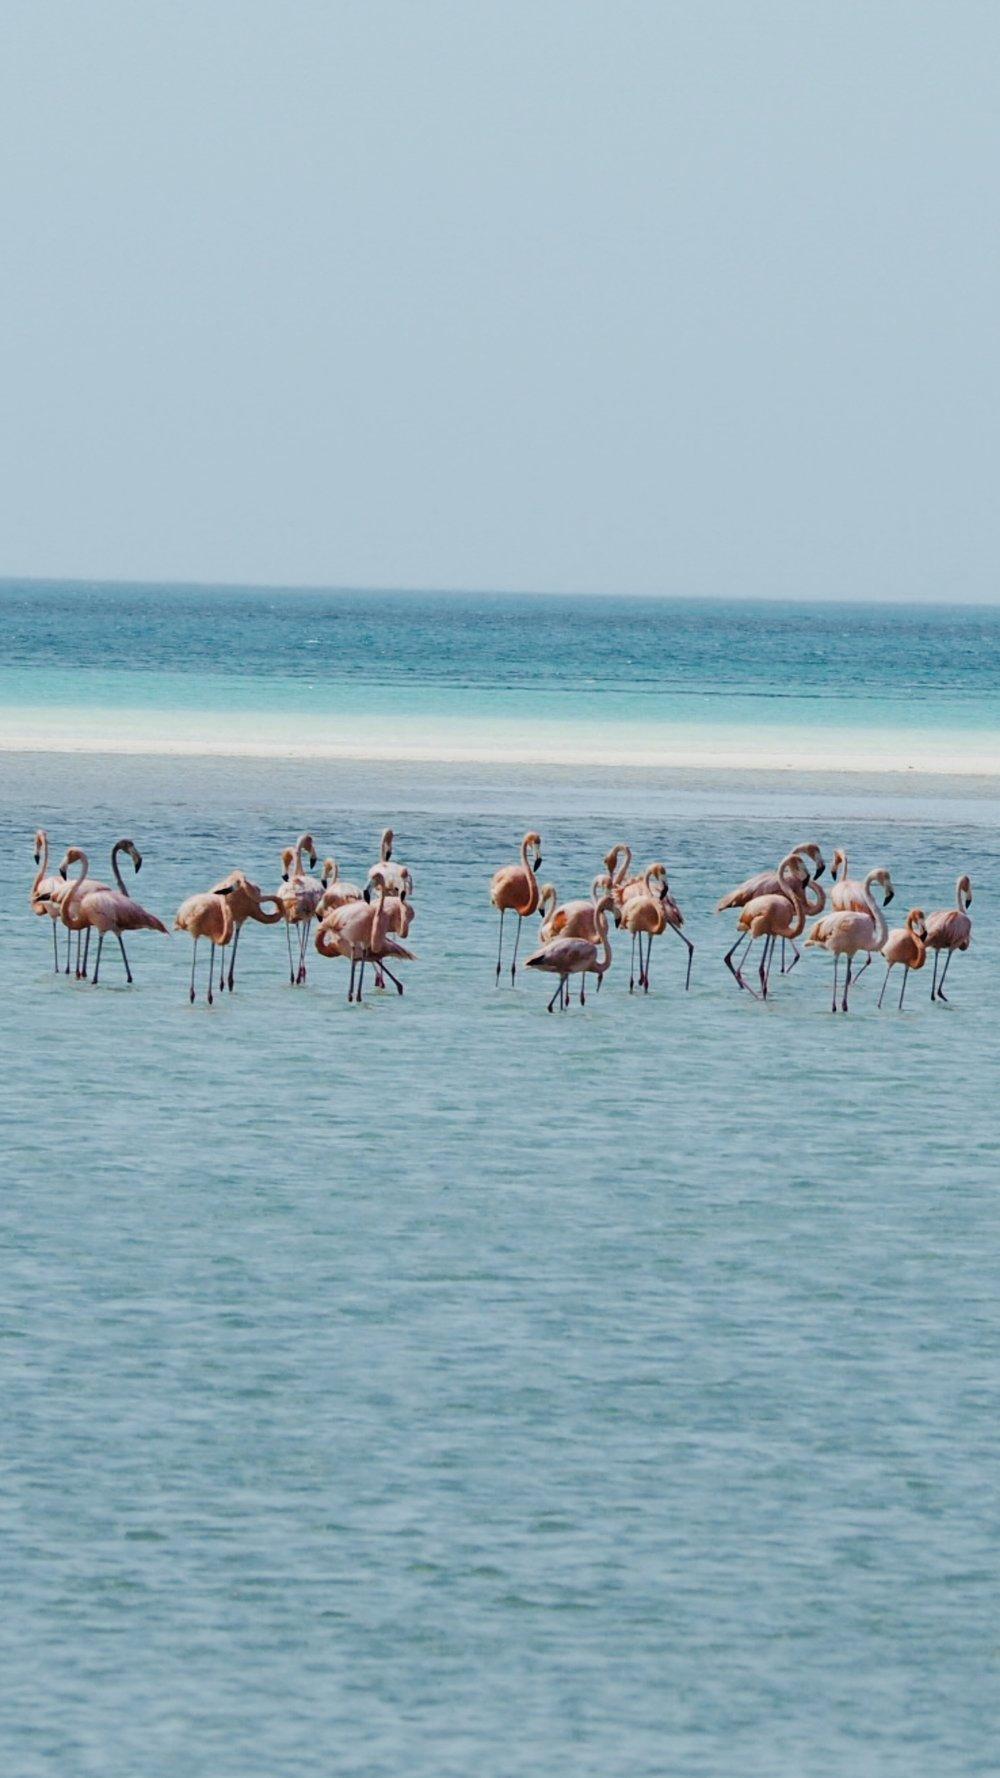 A flamboyance of flamingos in Isla Holbox